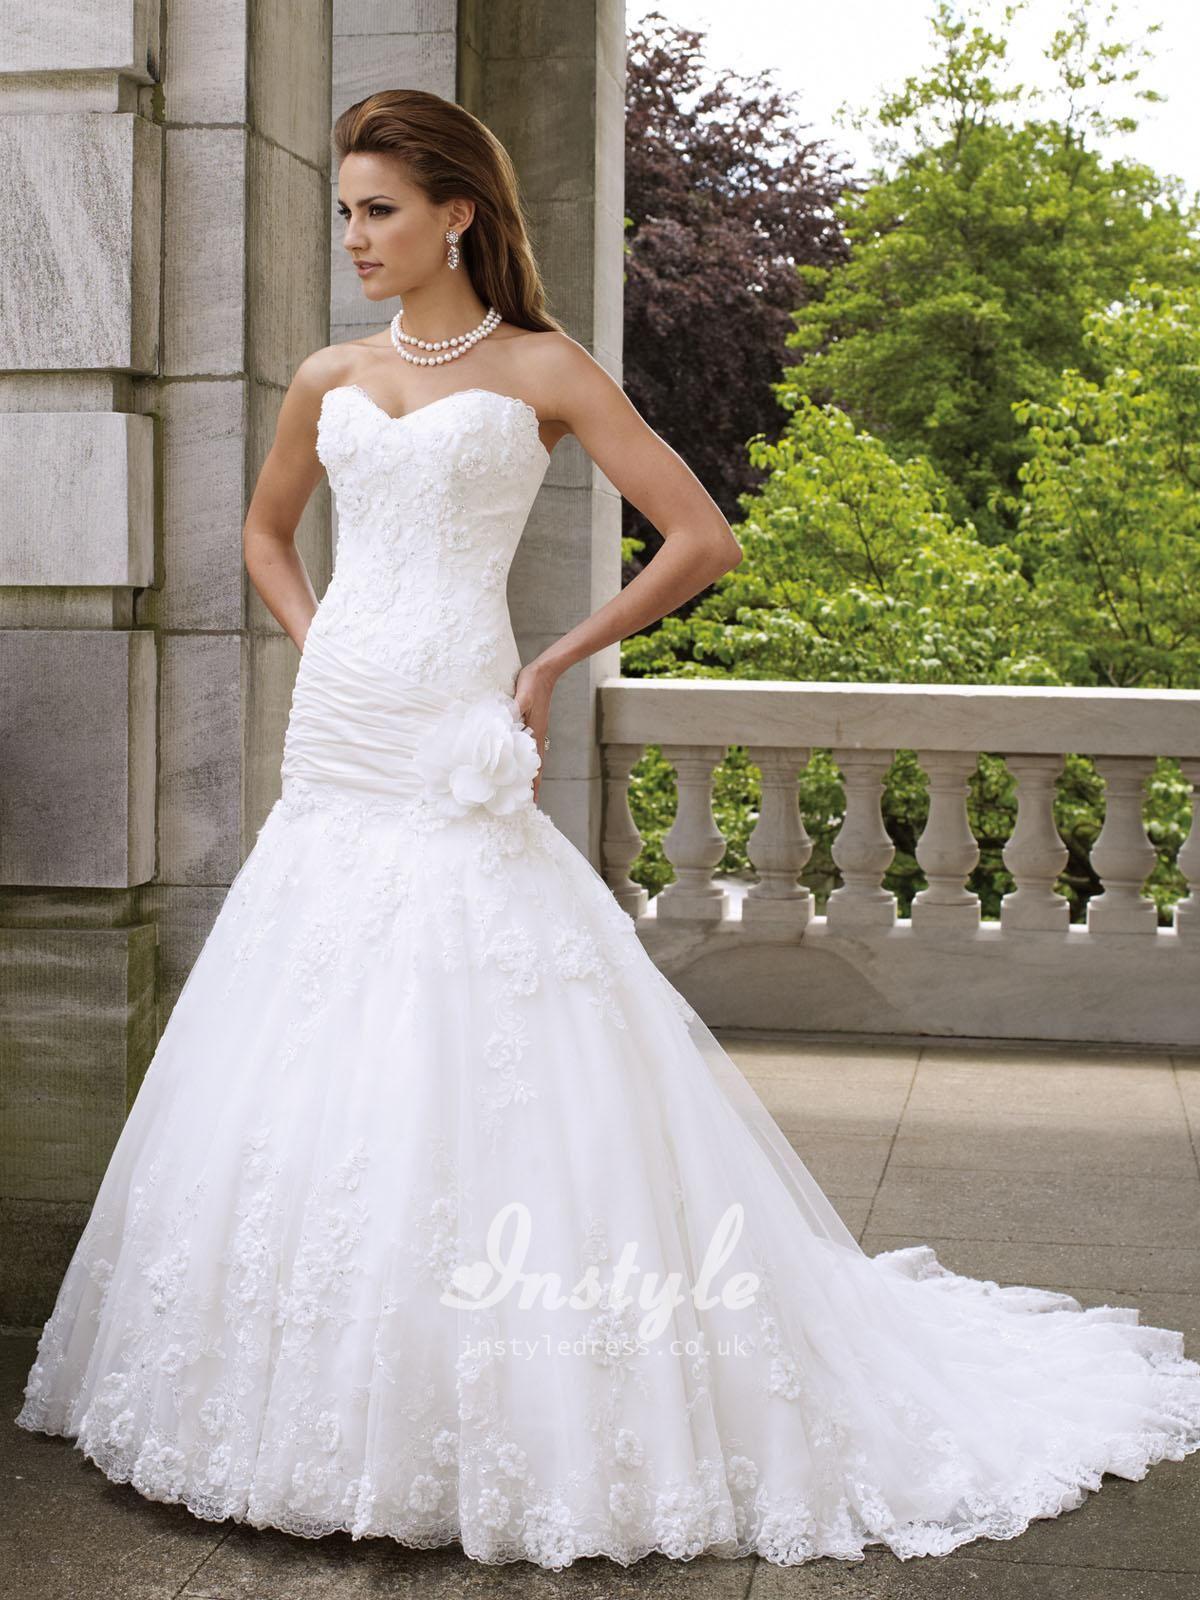 Strapless Sweetheart Crystals A Line Beautiful 3d Flower Wedding Dress Uk